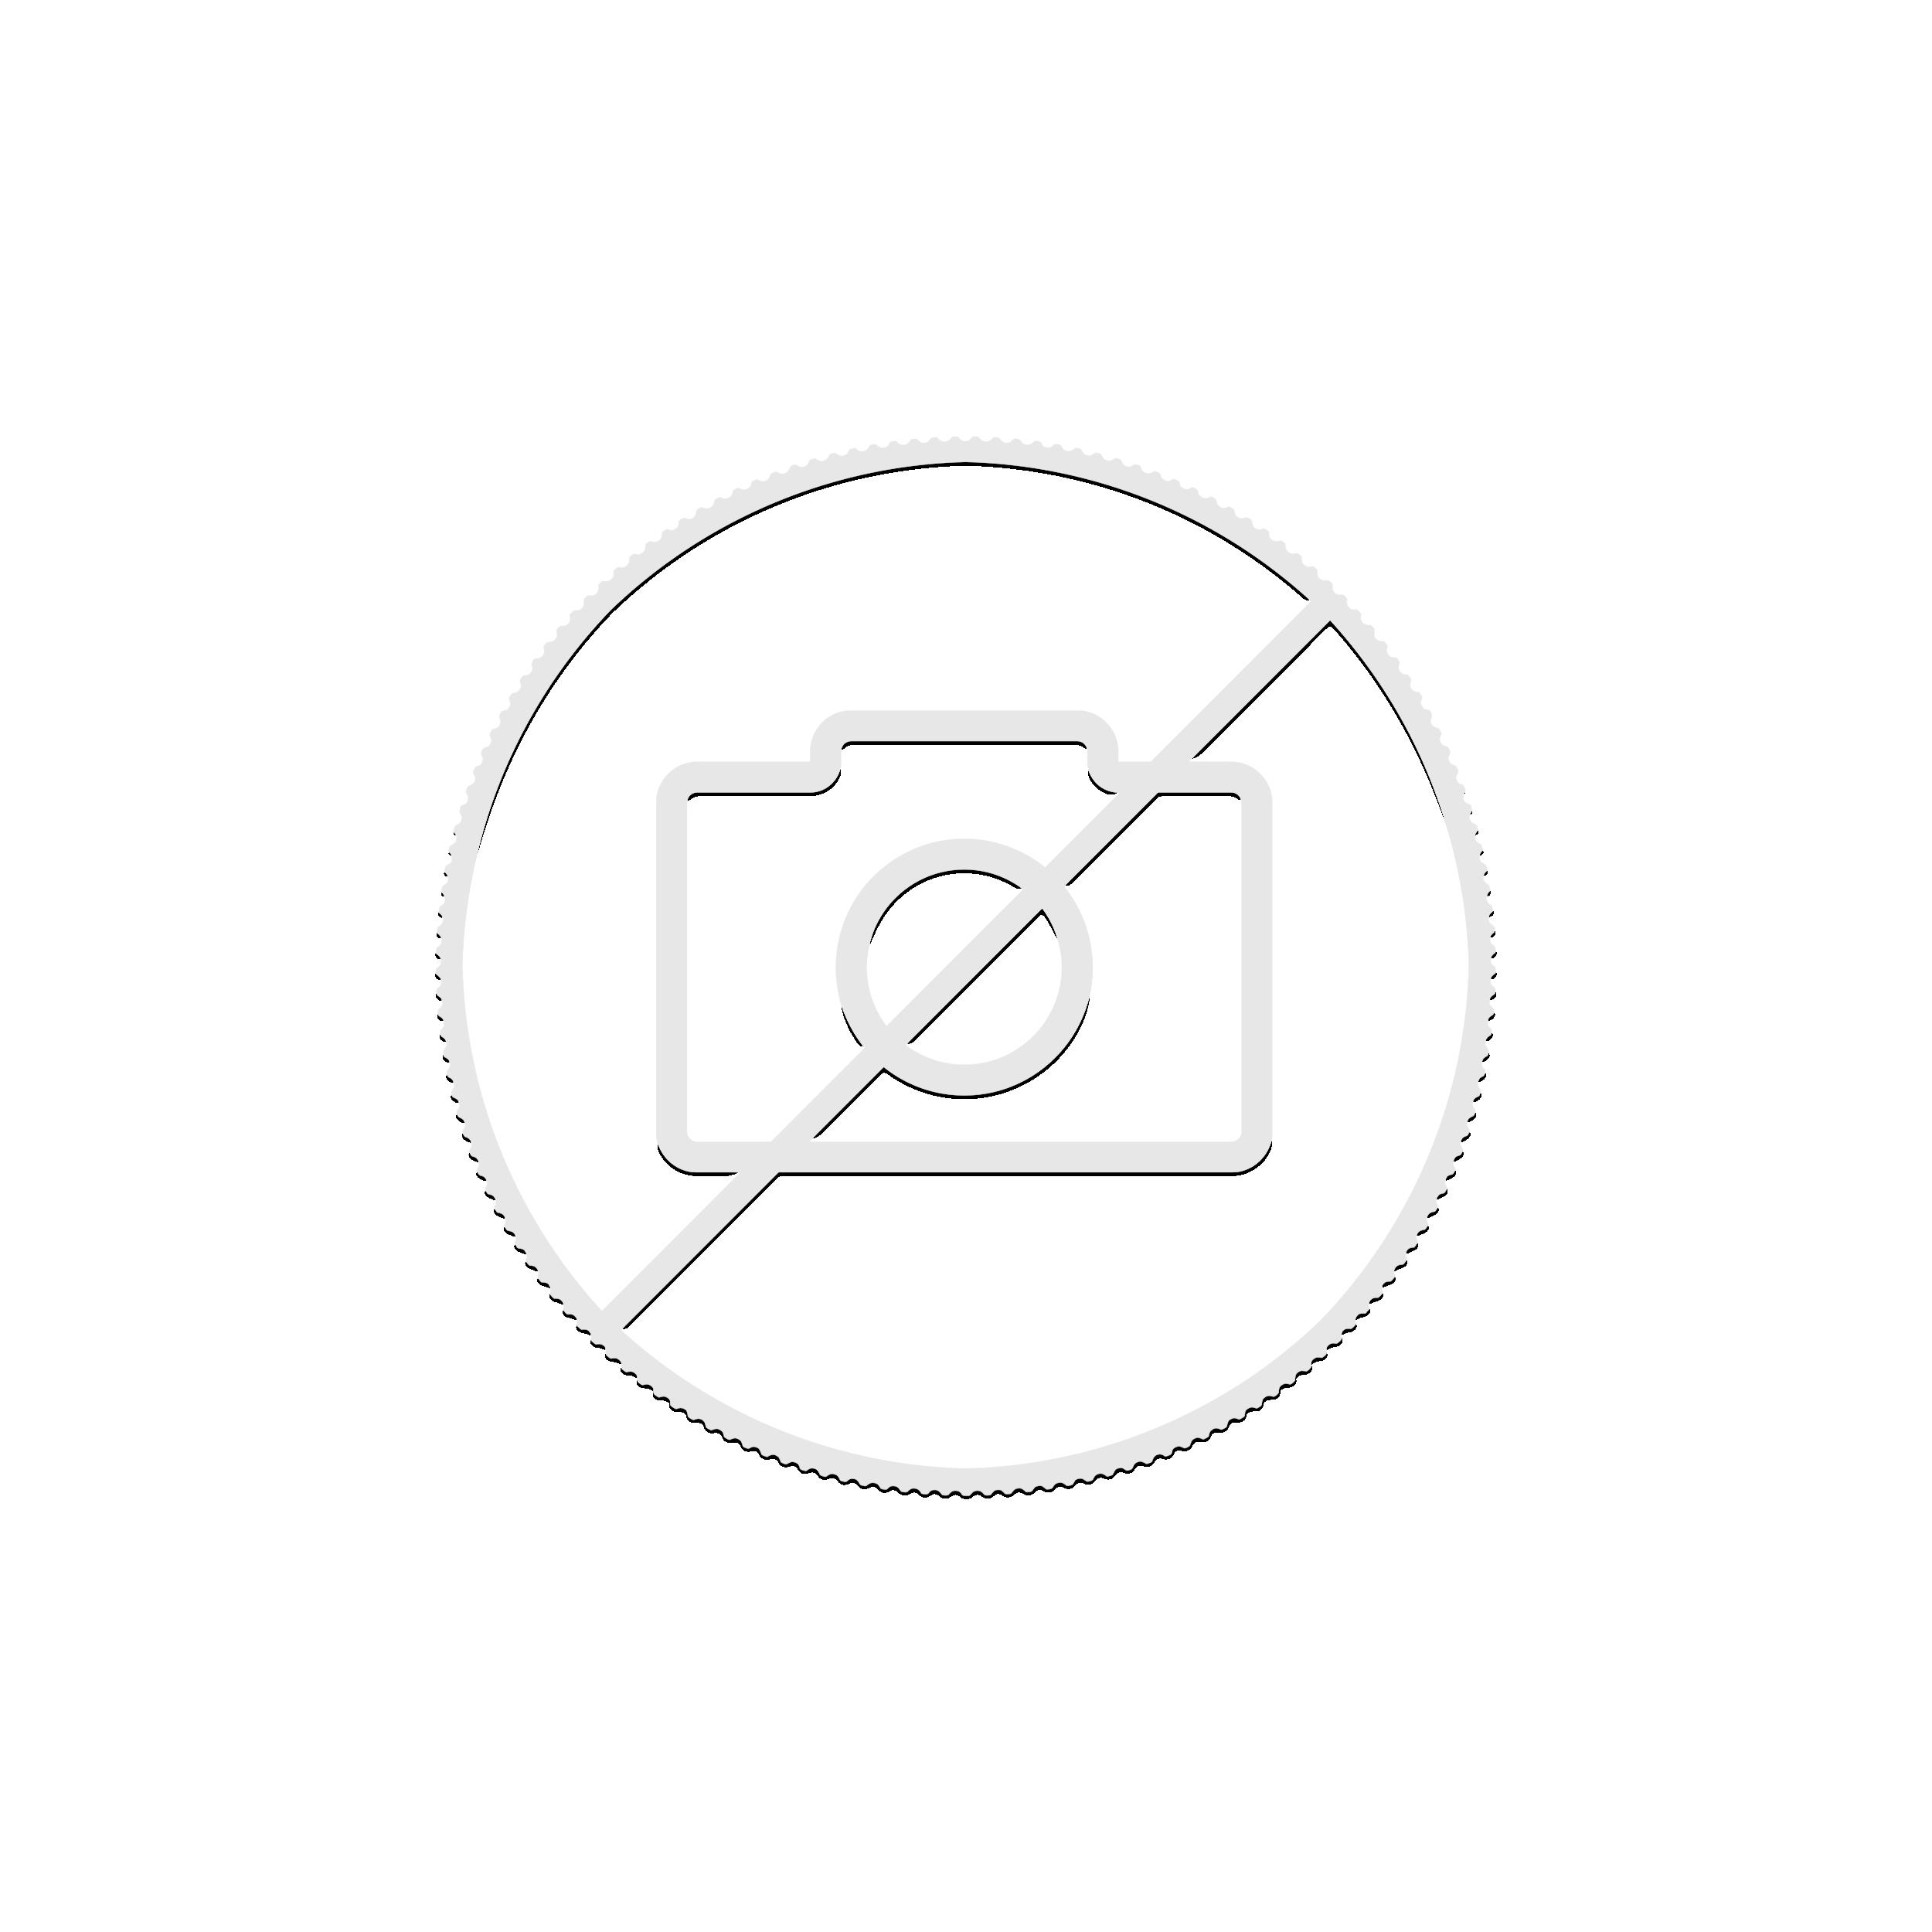 1 troy ounce zilveren munt Disney fantasia 80-jarig jubileum 2021 - achterkant